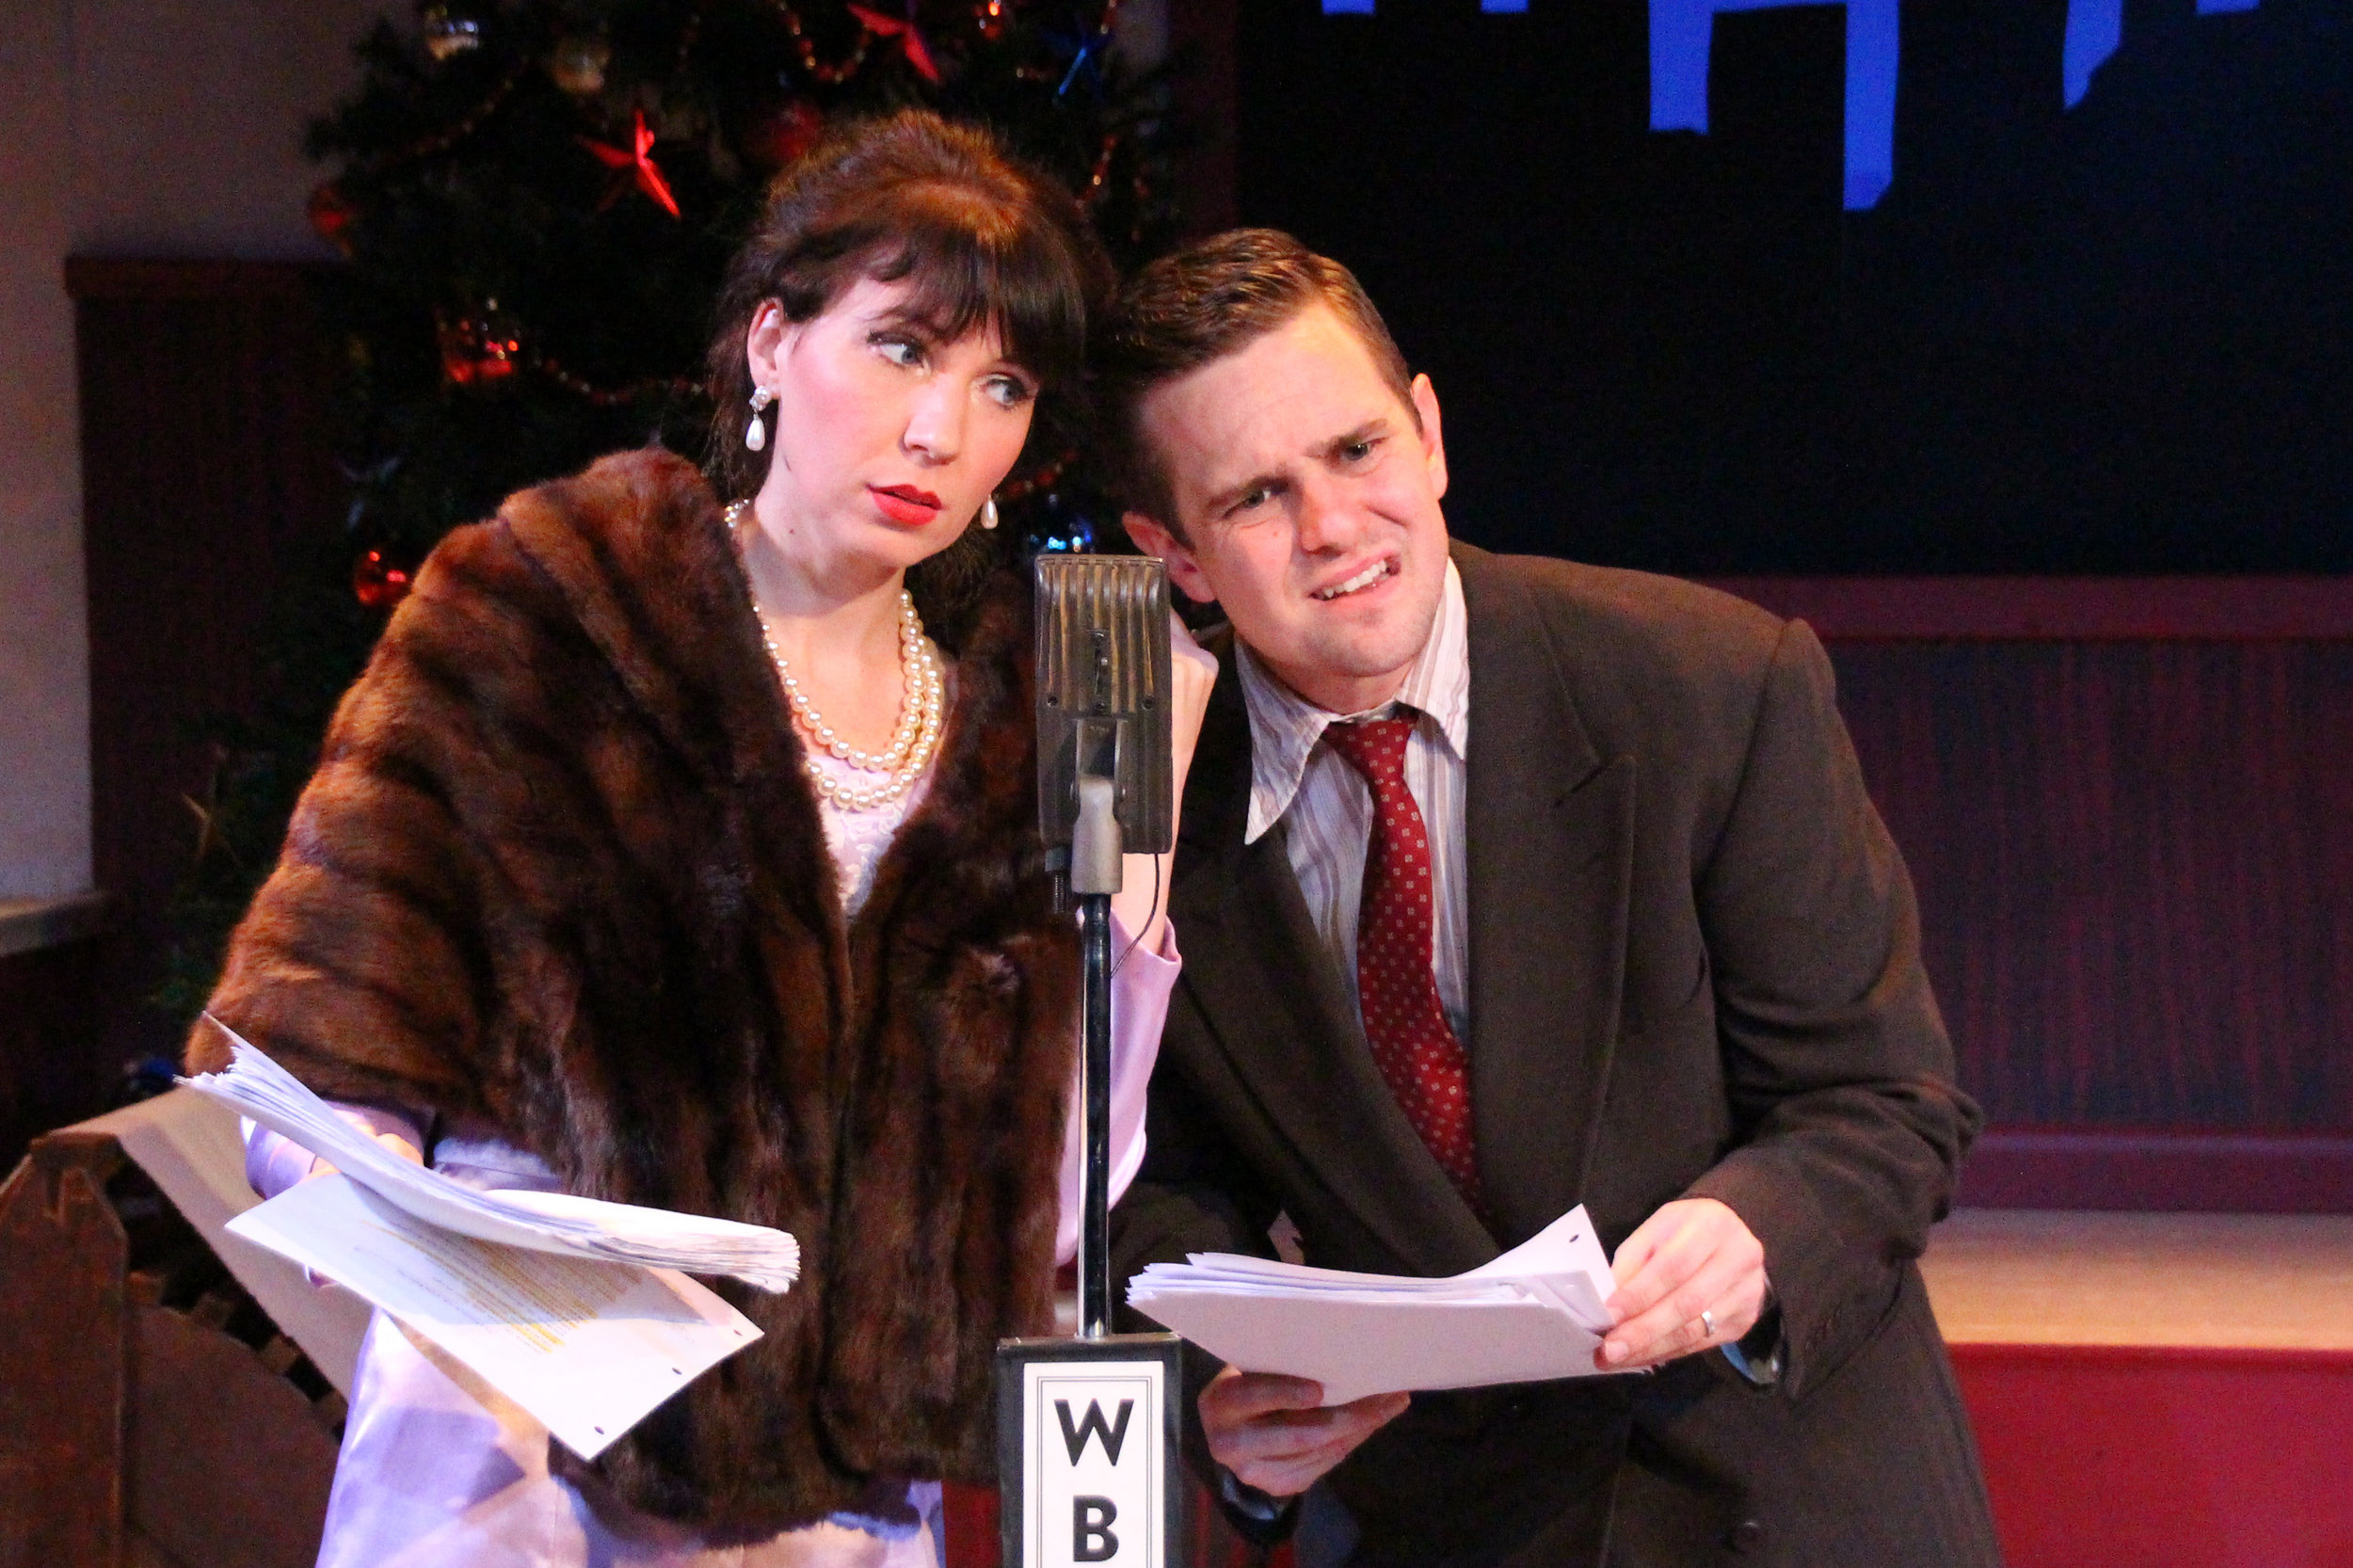 Elizabeth Donnelly and Jon-Michael Miller